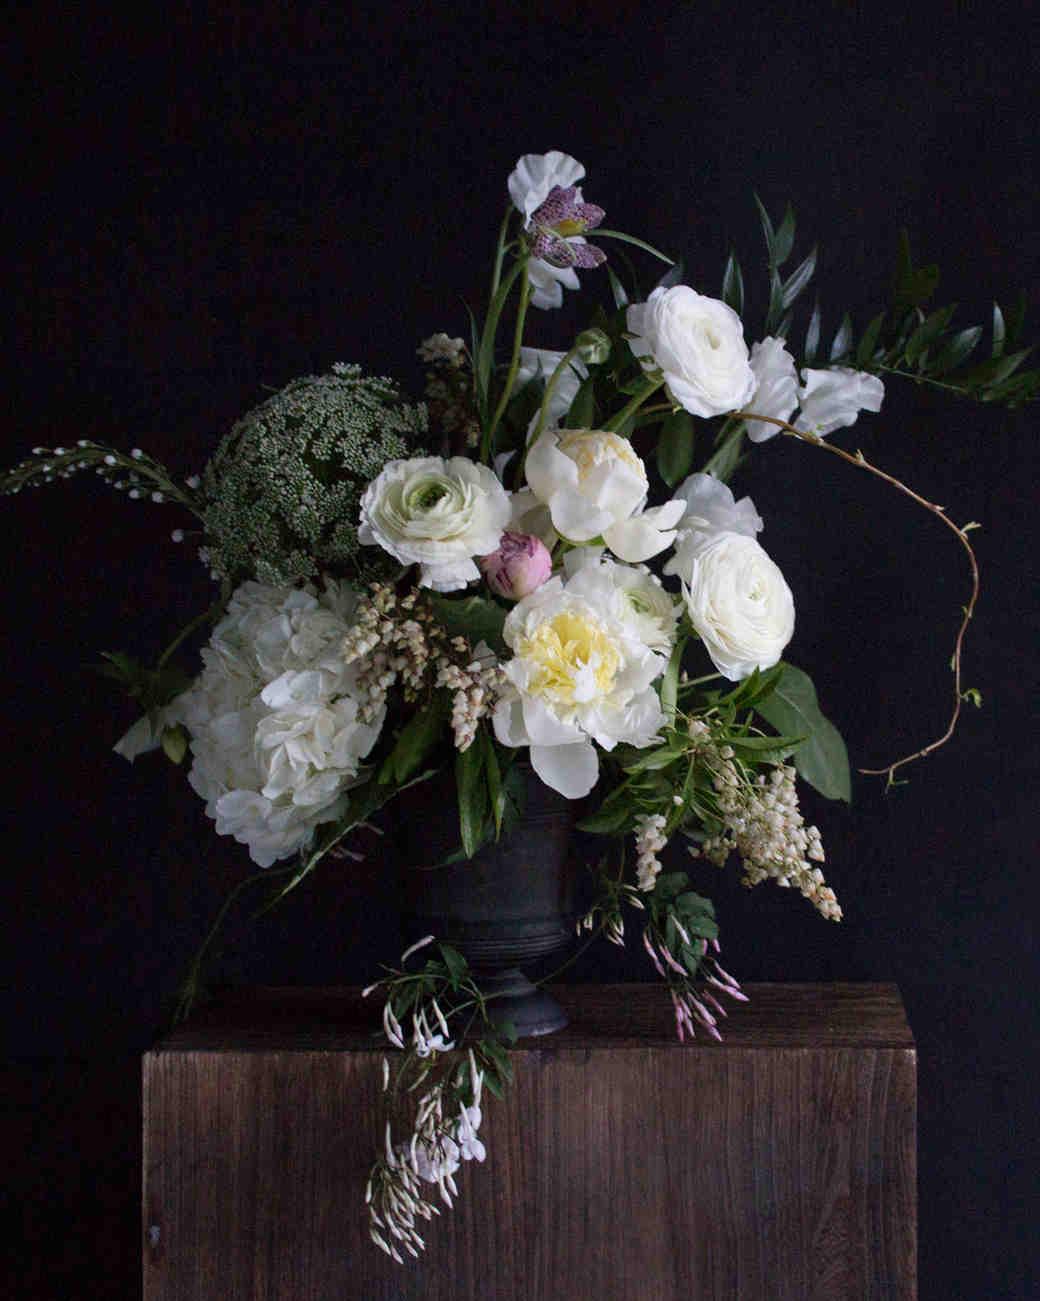 spring-floral-trend-4-0315.jpg